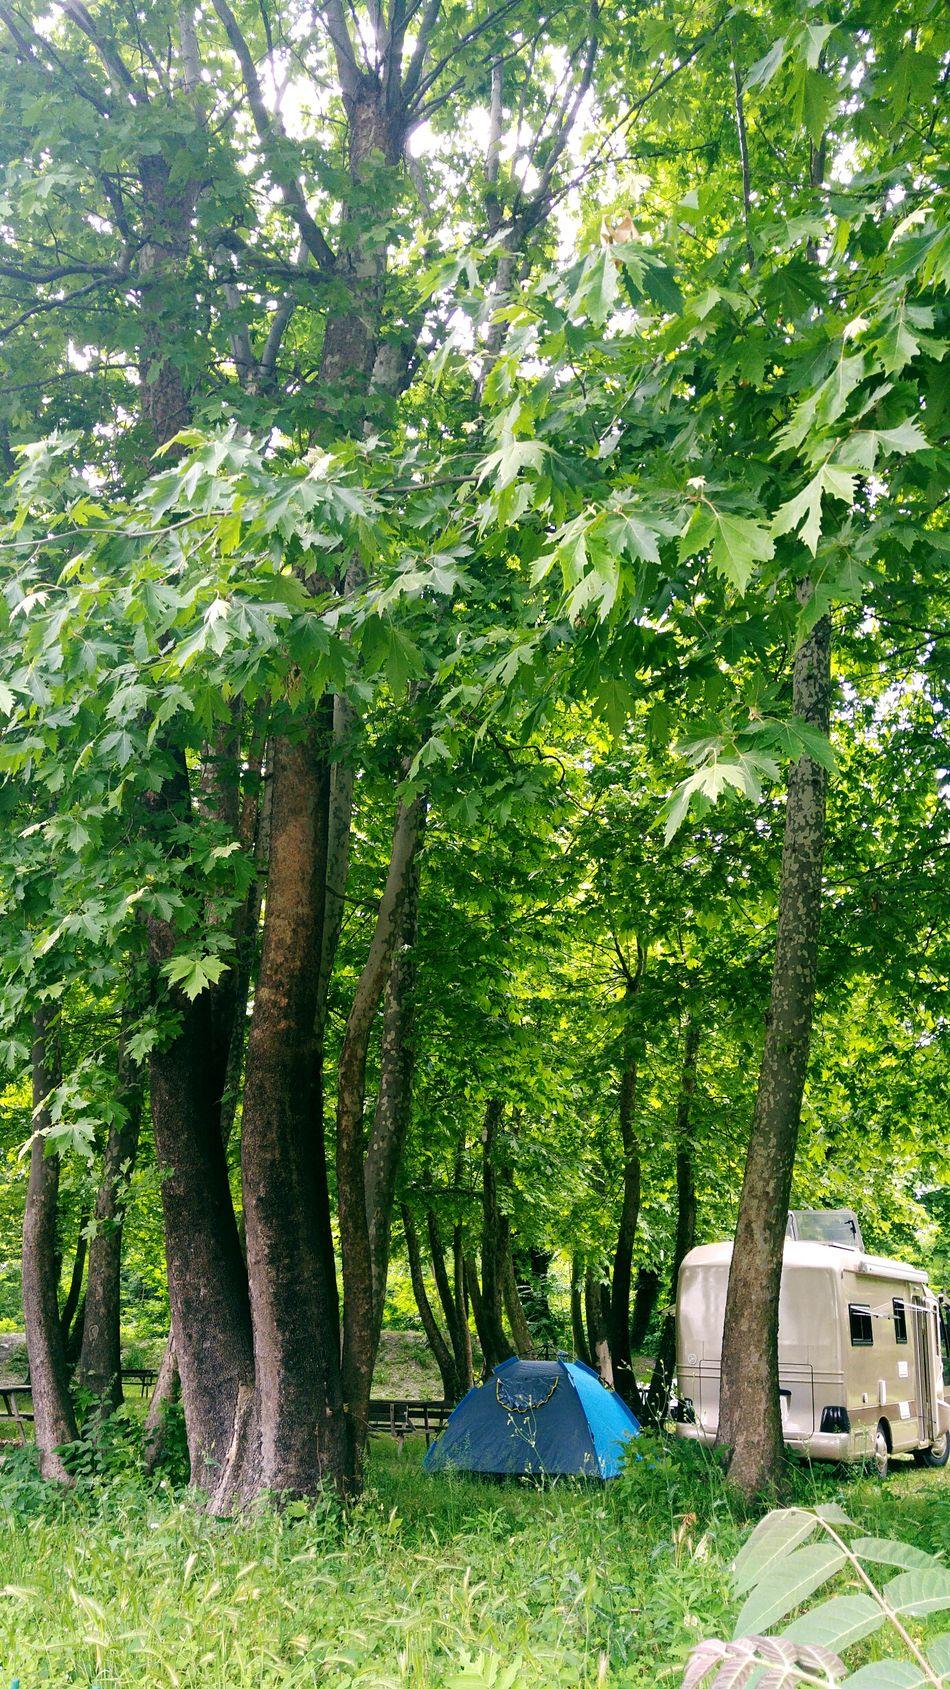 Yeşil Doğa Yeşil Green Color Orman Kamp Karavan Güneş,mutluluk,huzur :) Tree Nature Nature Photography Nature_collection Naturephotography LG Phone Camera Ağaçlar ♥♡♥ Nature_perfection Nature Beauty çadır